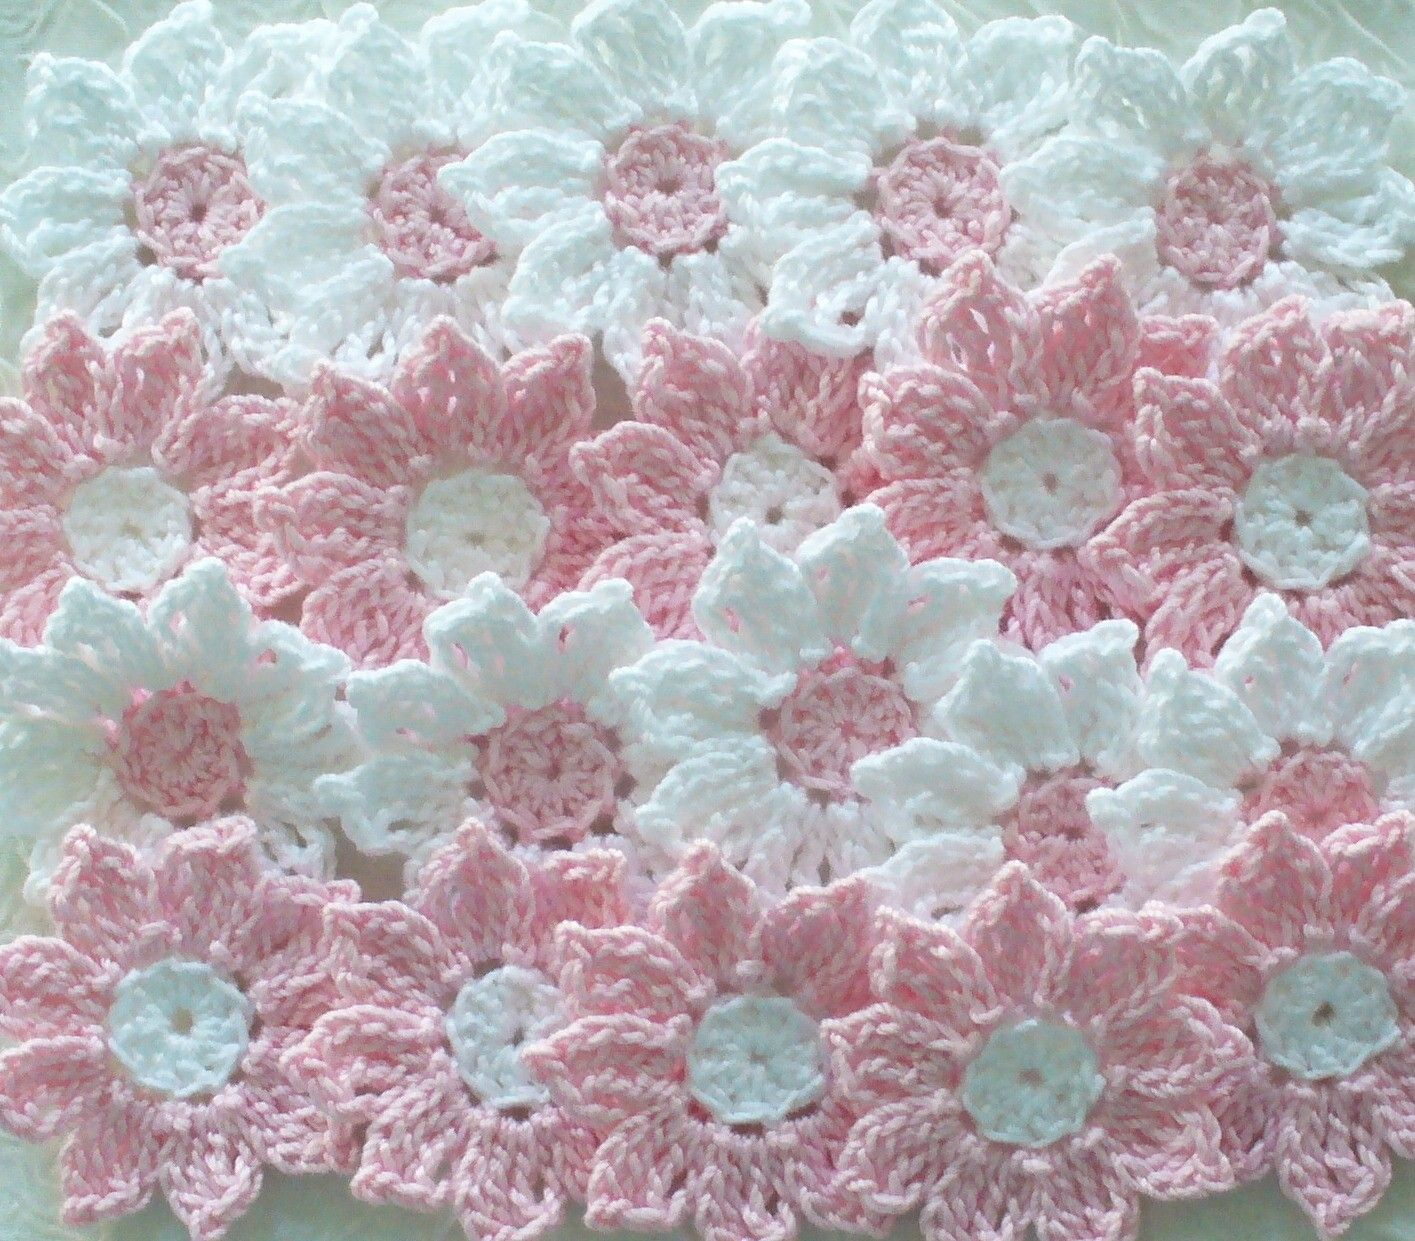 Pink and white crochet daisy flowers items similar to pink and white crochet daisy flowers handmade embellishments set of 12 on etsy izmirmasajfo